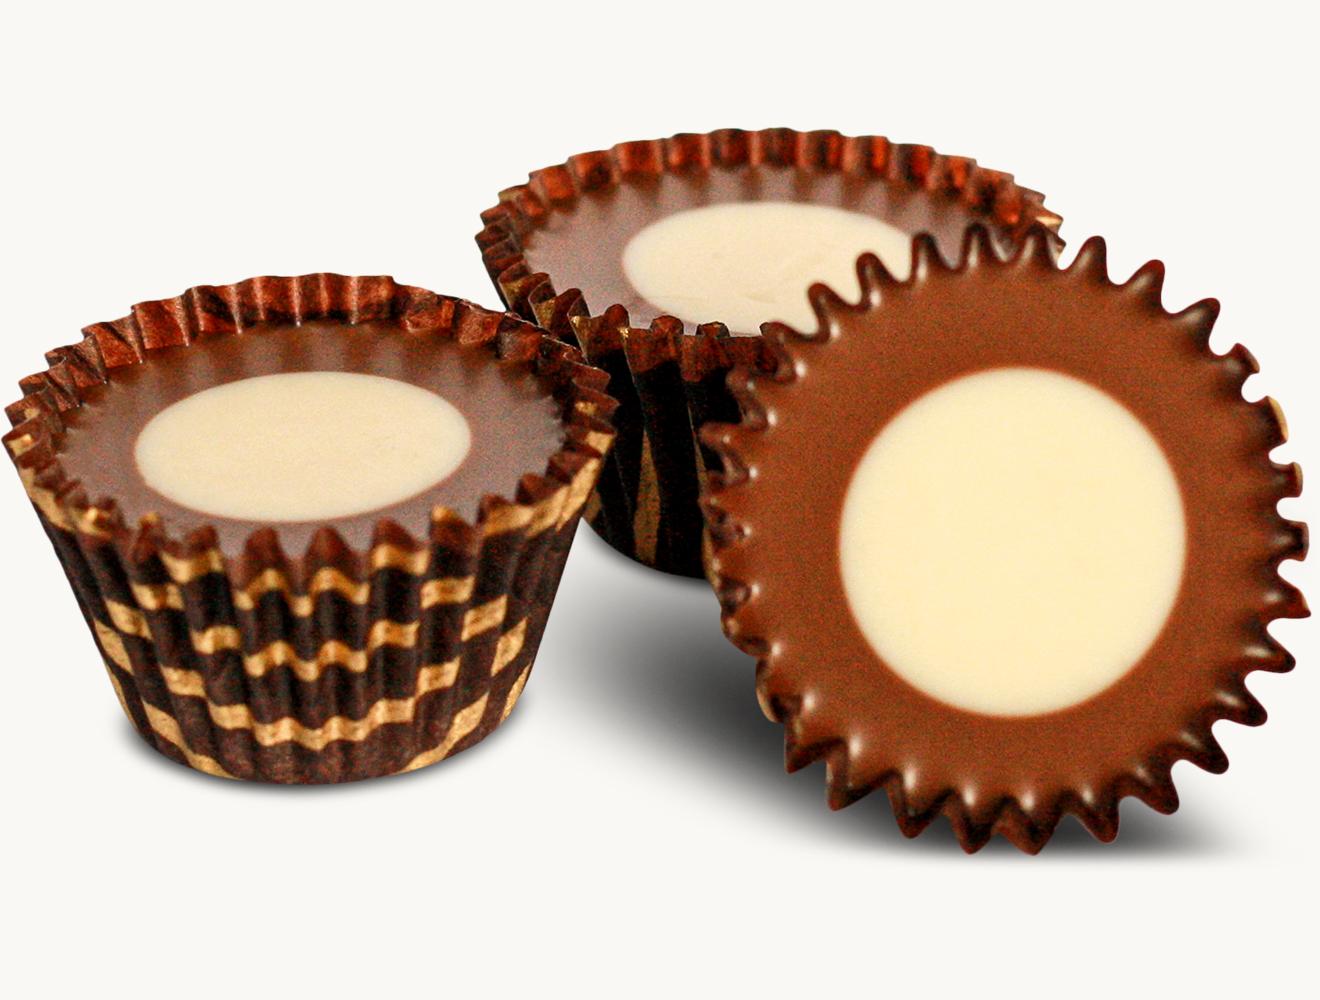 Pralinetti Latte Macchiato